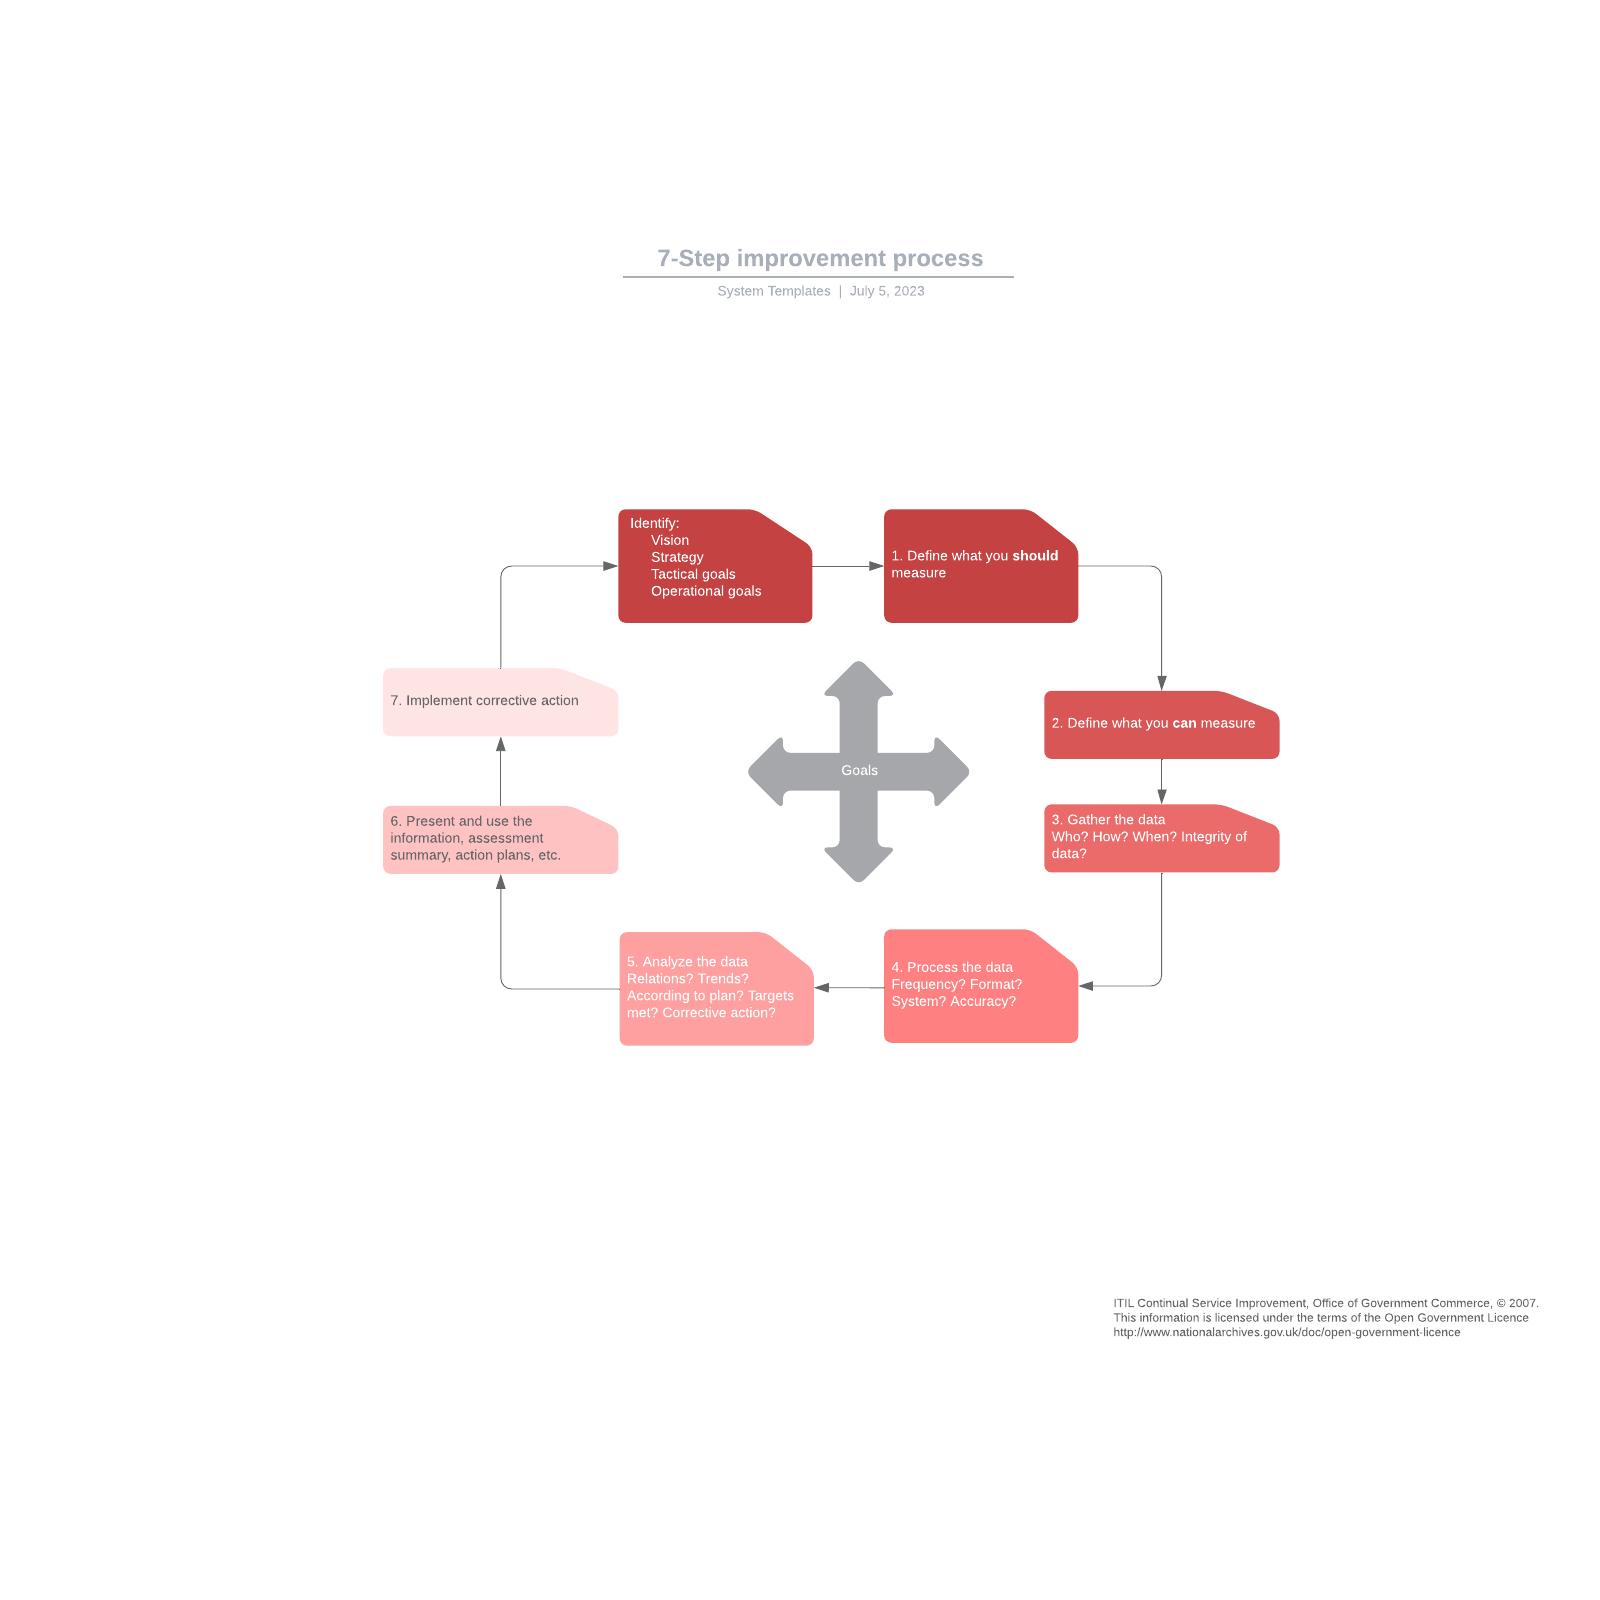 7-step improvement process